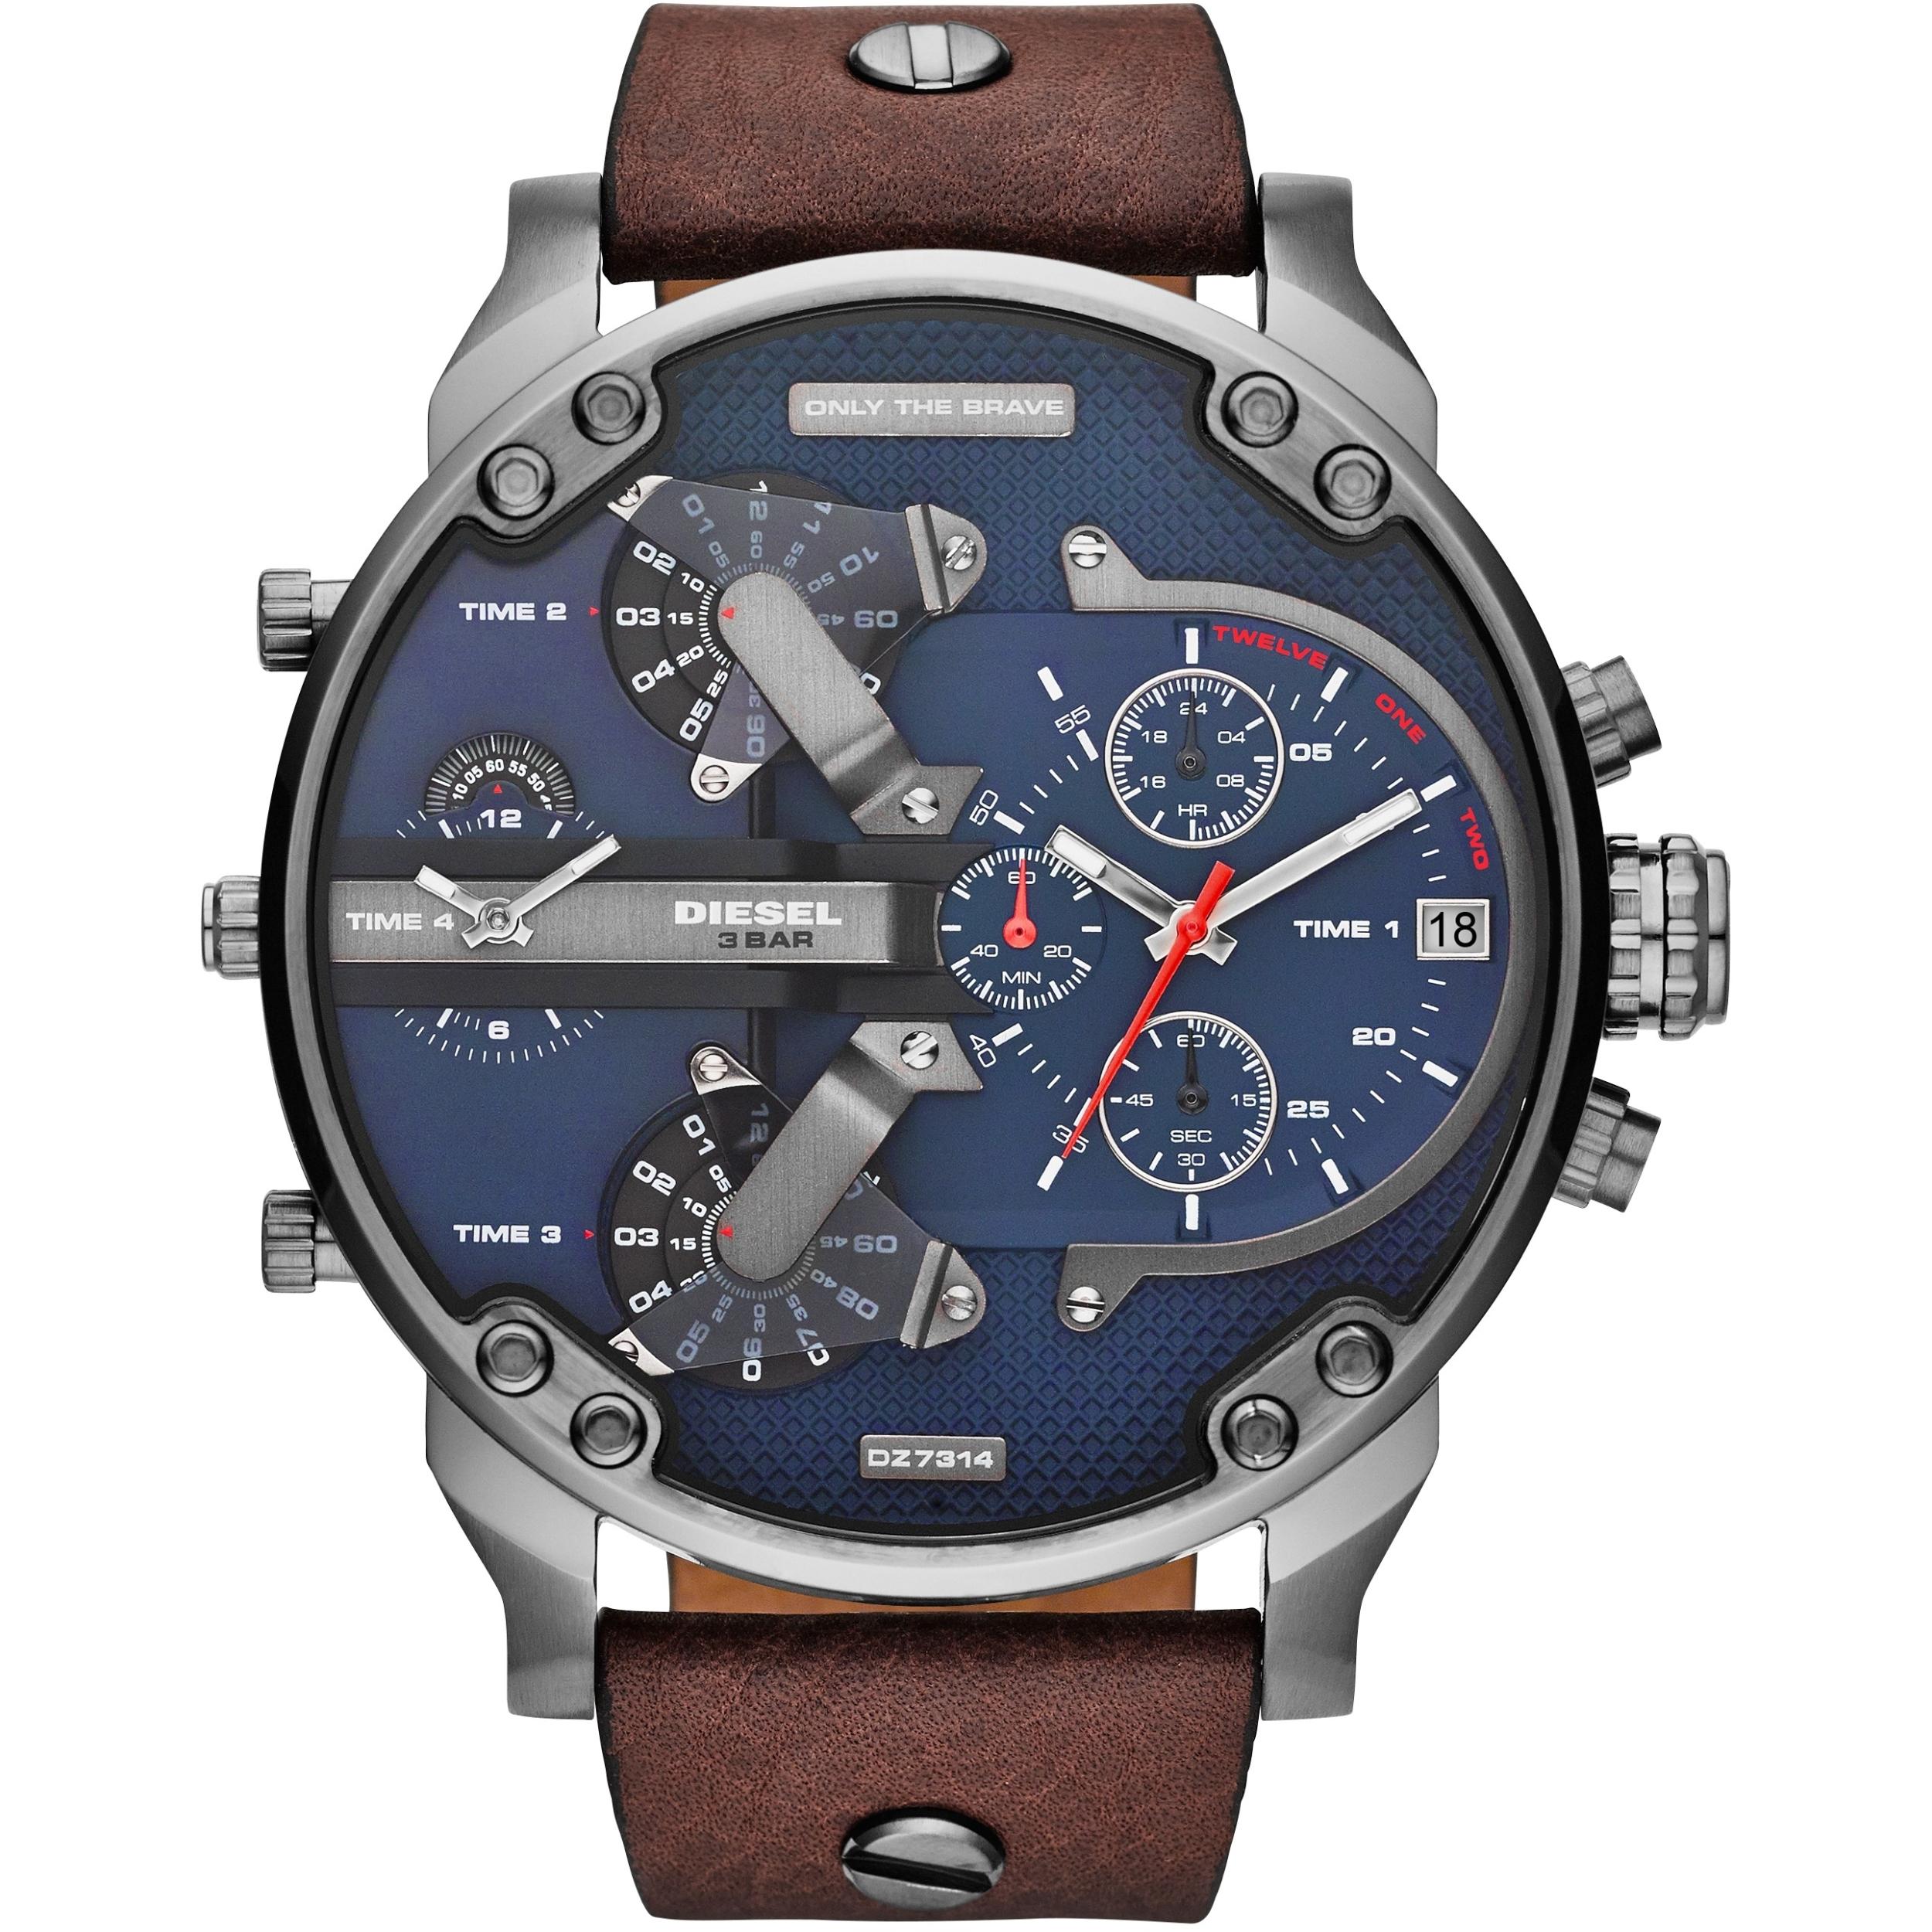 3eb130560 Gents Diesel Daddy 2.0 Chronograph Watch (DZ7314) | WatchShop.com™